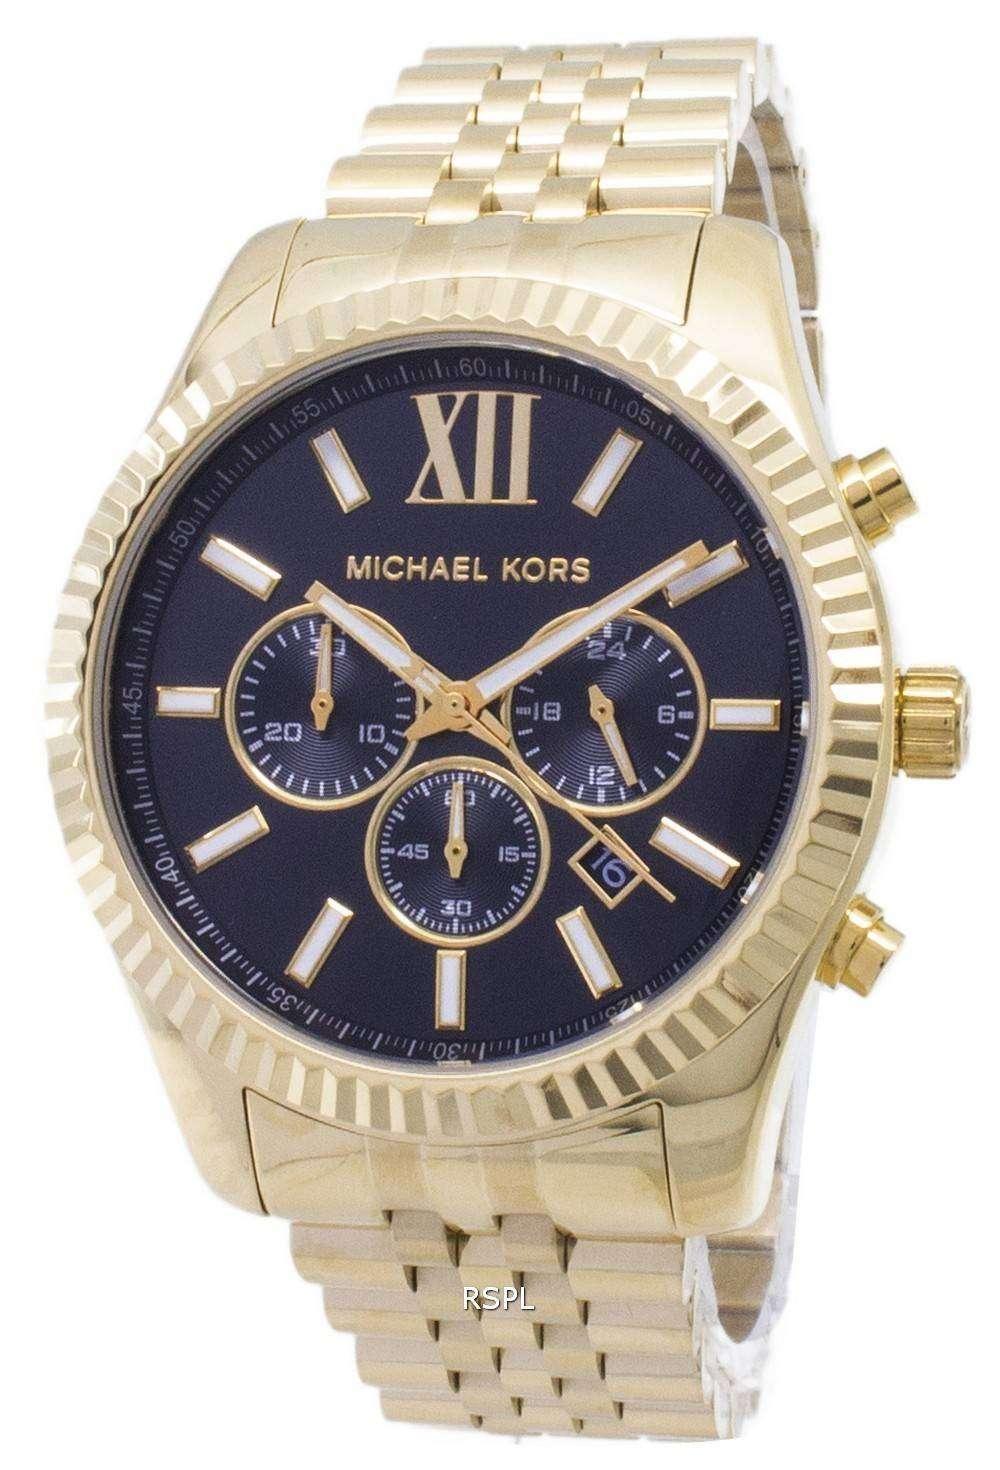 Michael Kors Chronograph Black Dial Gold Tone Mk8286 Mens